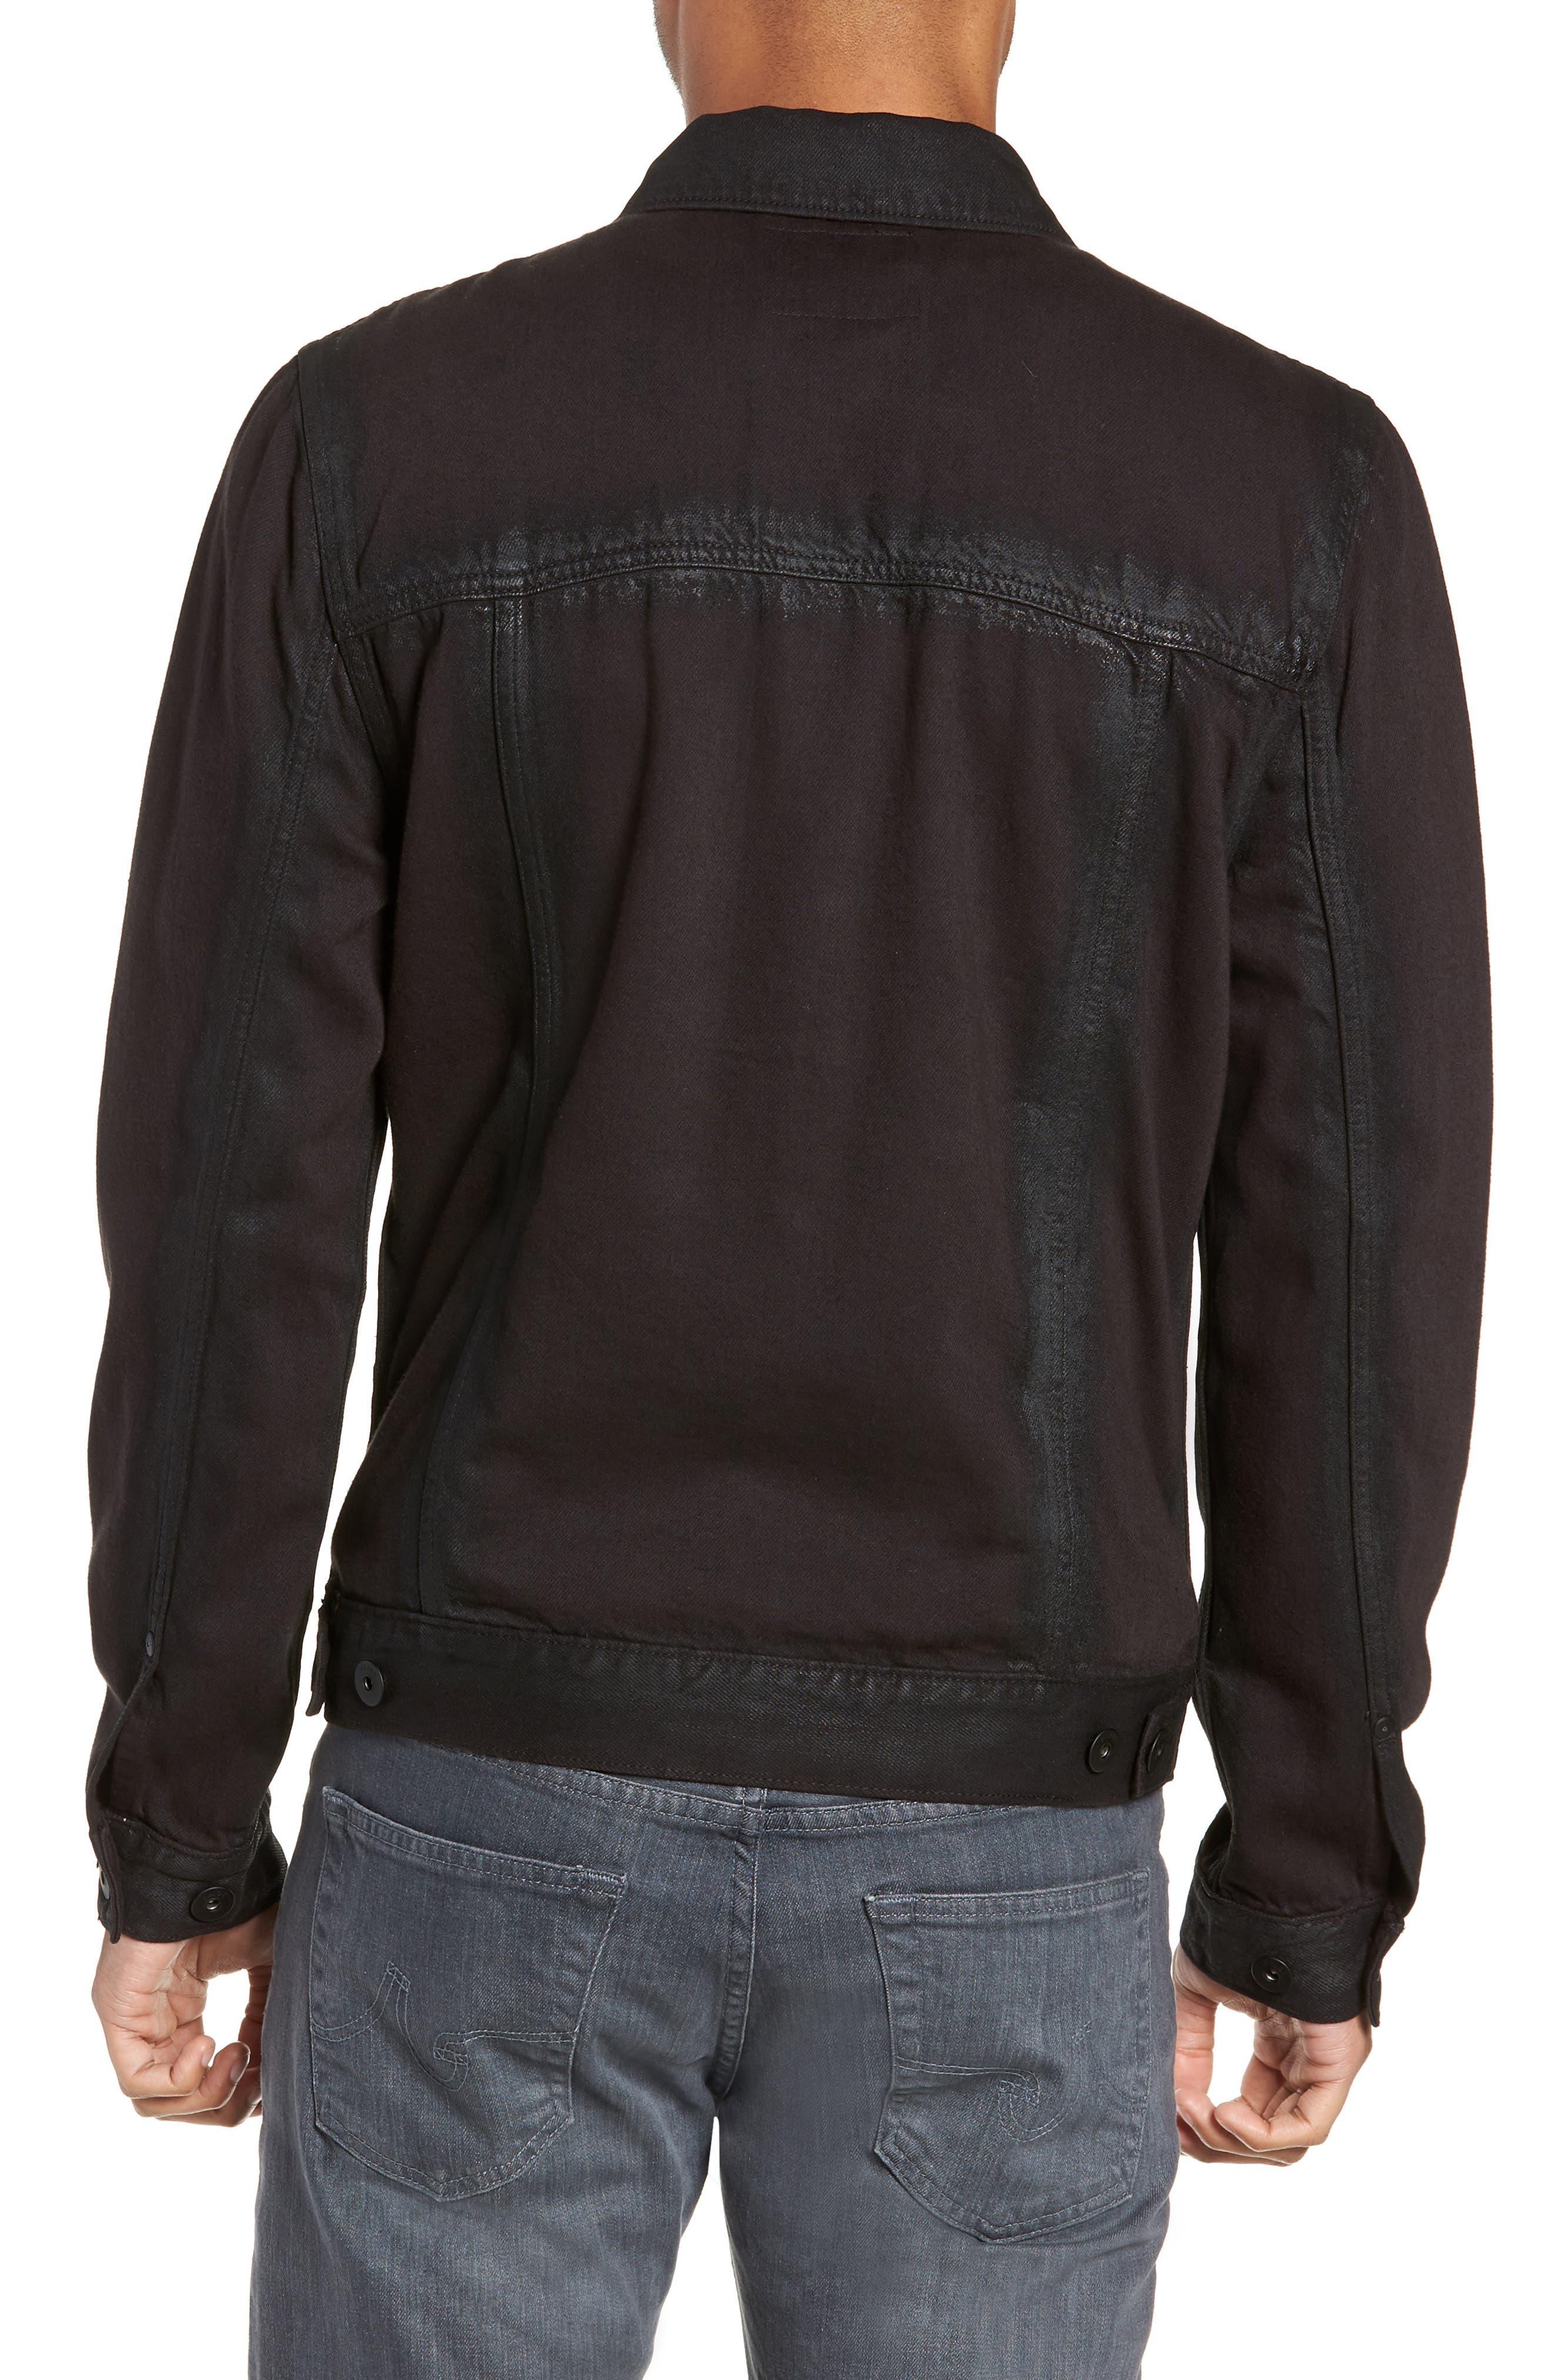 Scout Denim Jacket,                             Alternate thumbnail 2, color,                             VIVID BLACK COATED